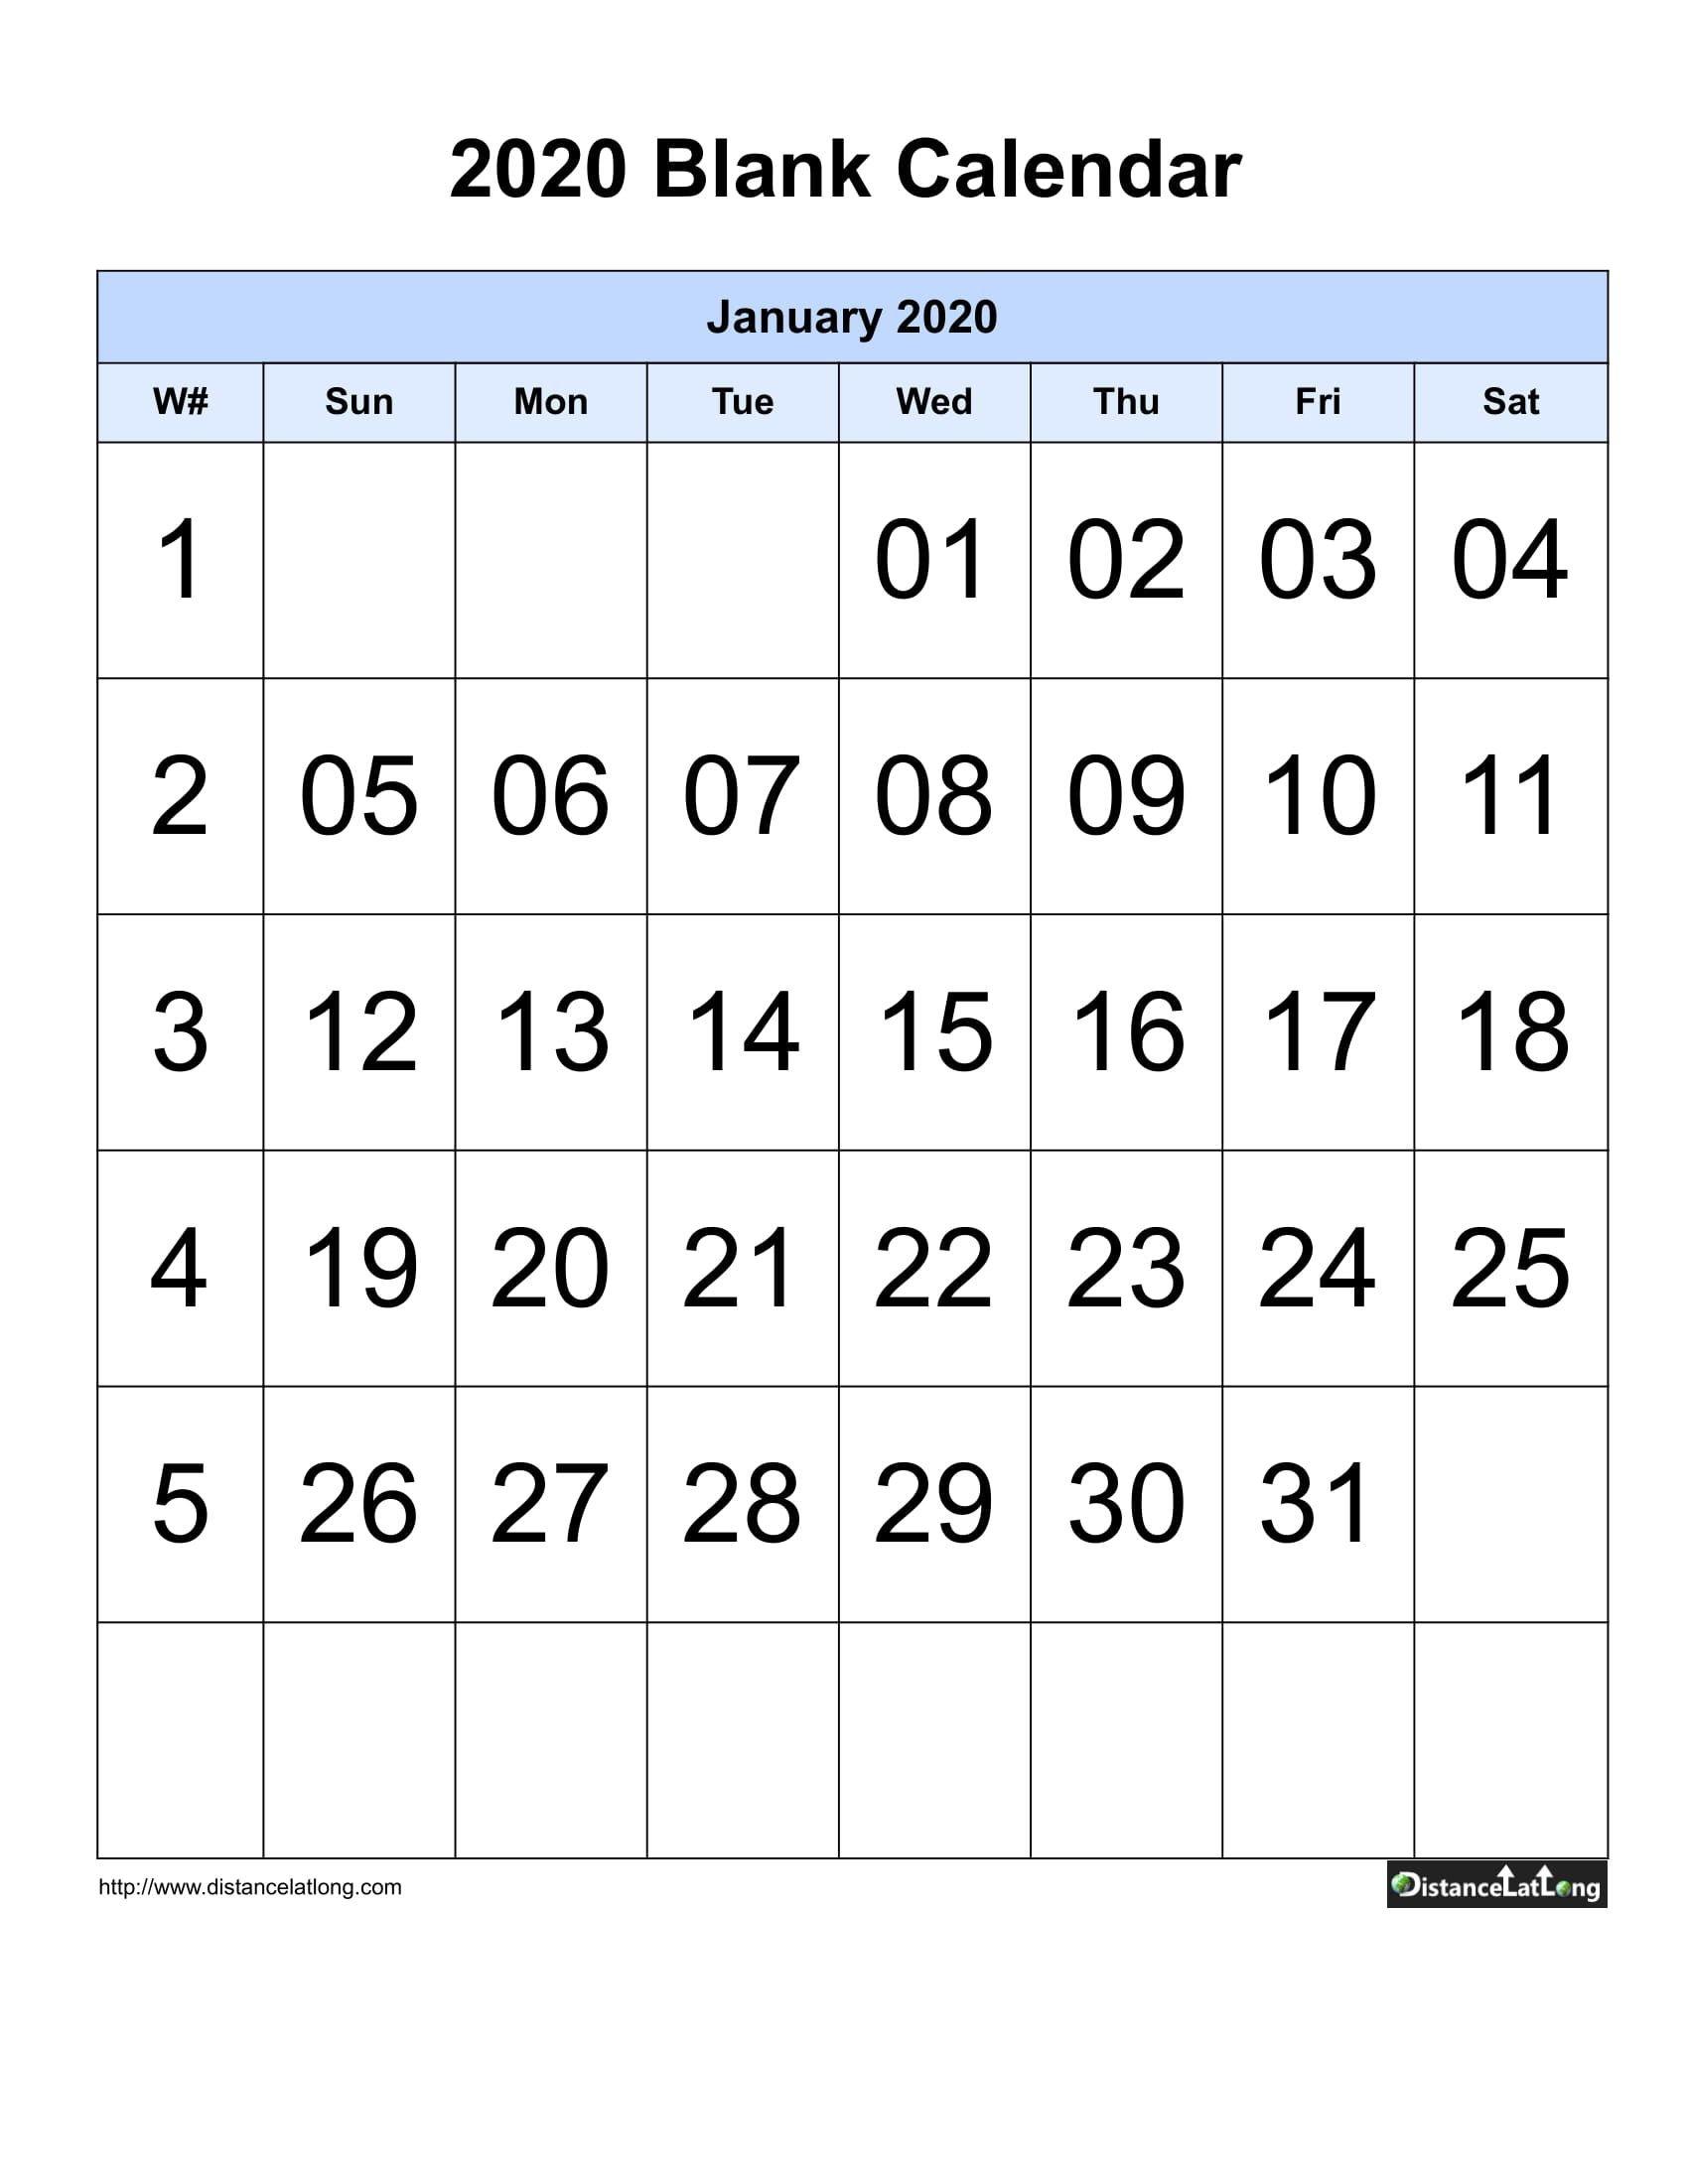 Printable 2020 Blank Calendar Blank Portrait Orientation Blank Sunday Through Saturday Calendar